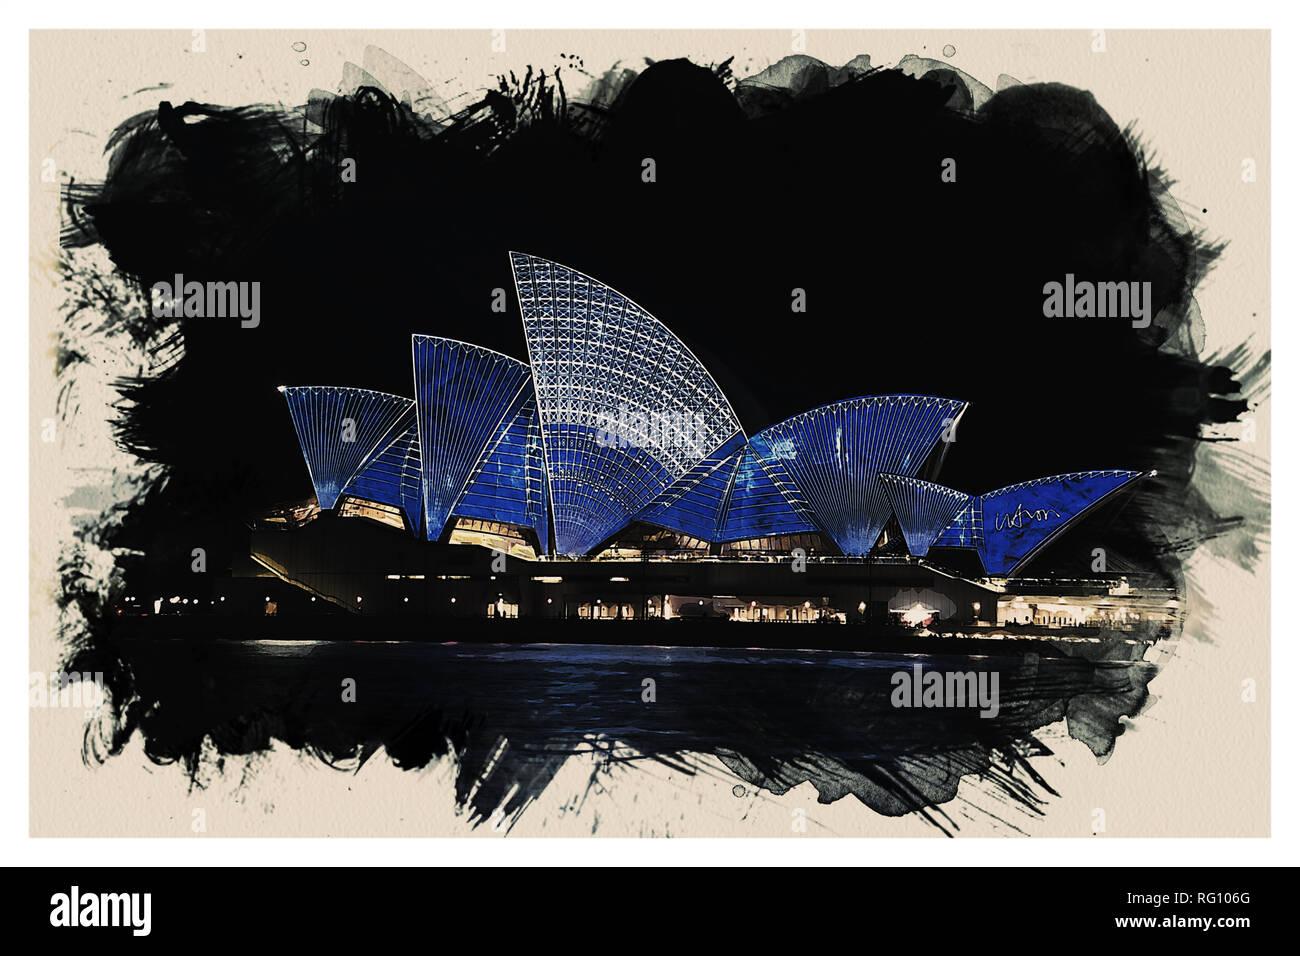 Wonders of the Worlds - Opera House of Sydney.jpg - RG106G 1RG106G - Stock Image